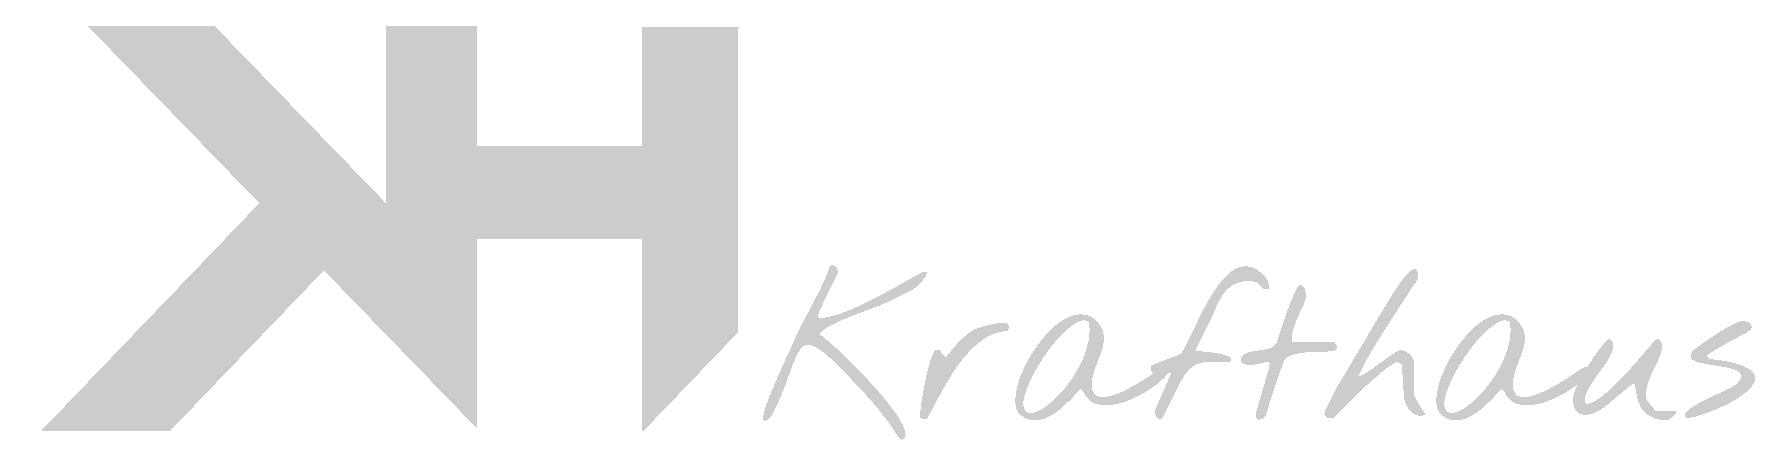 Backing to main header logo